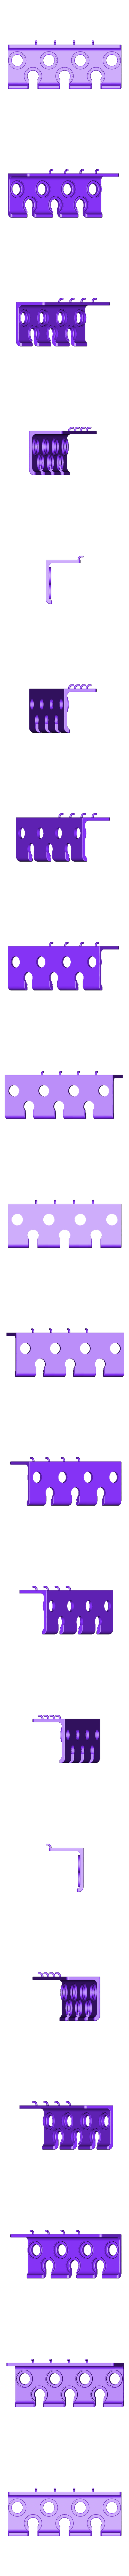 80225_pins.stl Download free STL file Socket Wrench Screwdriver Set 7pcs Tool Holder 013 I for screws or peg board • Design to 3D print, Wiesemann1893